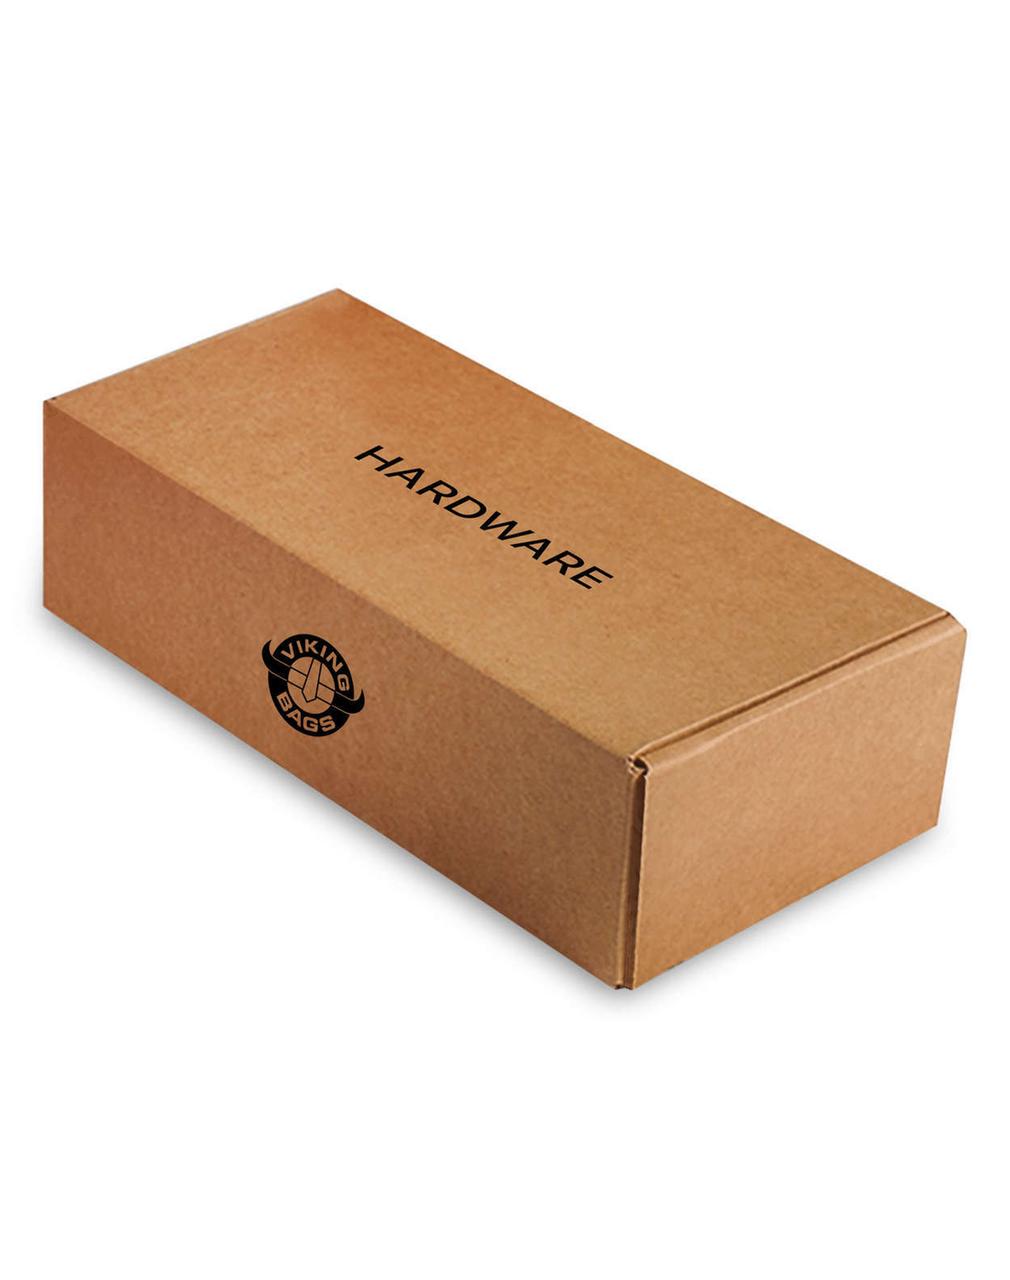 Honda 1500 Valkyrie Interstate Charger Medium Slanted Motorcycle Saddlebags Hardware Box